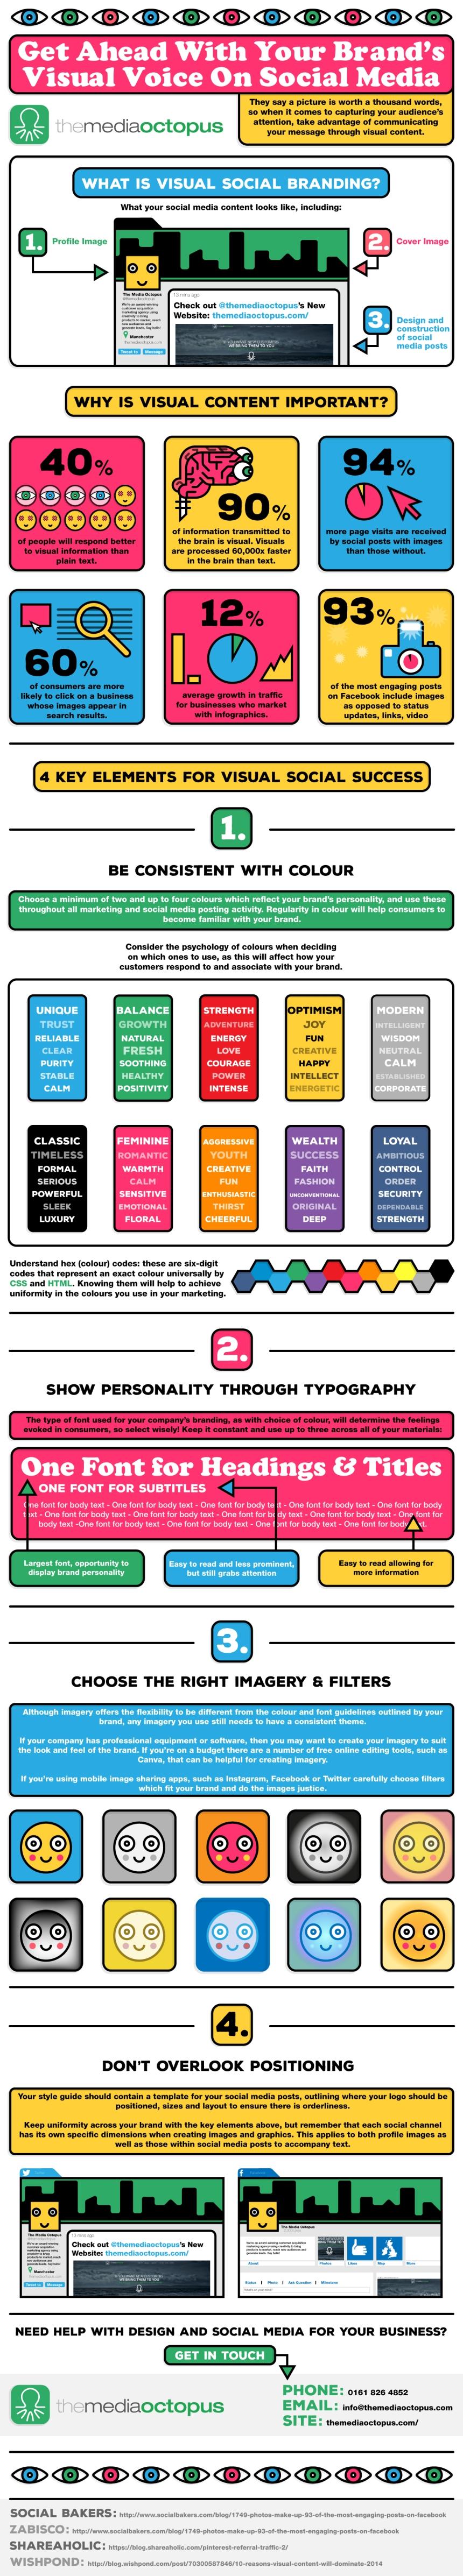 ¿Sabes que es Visual Social Branding?